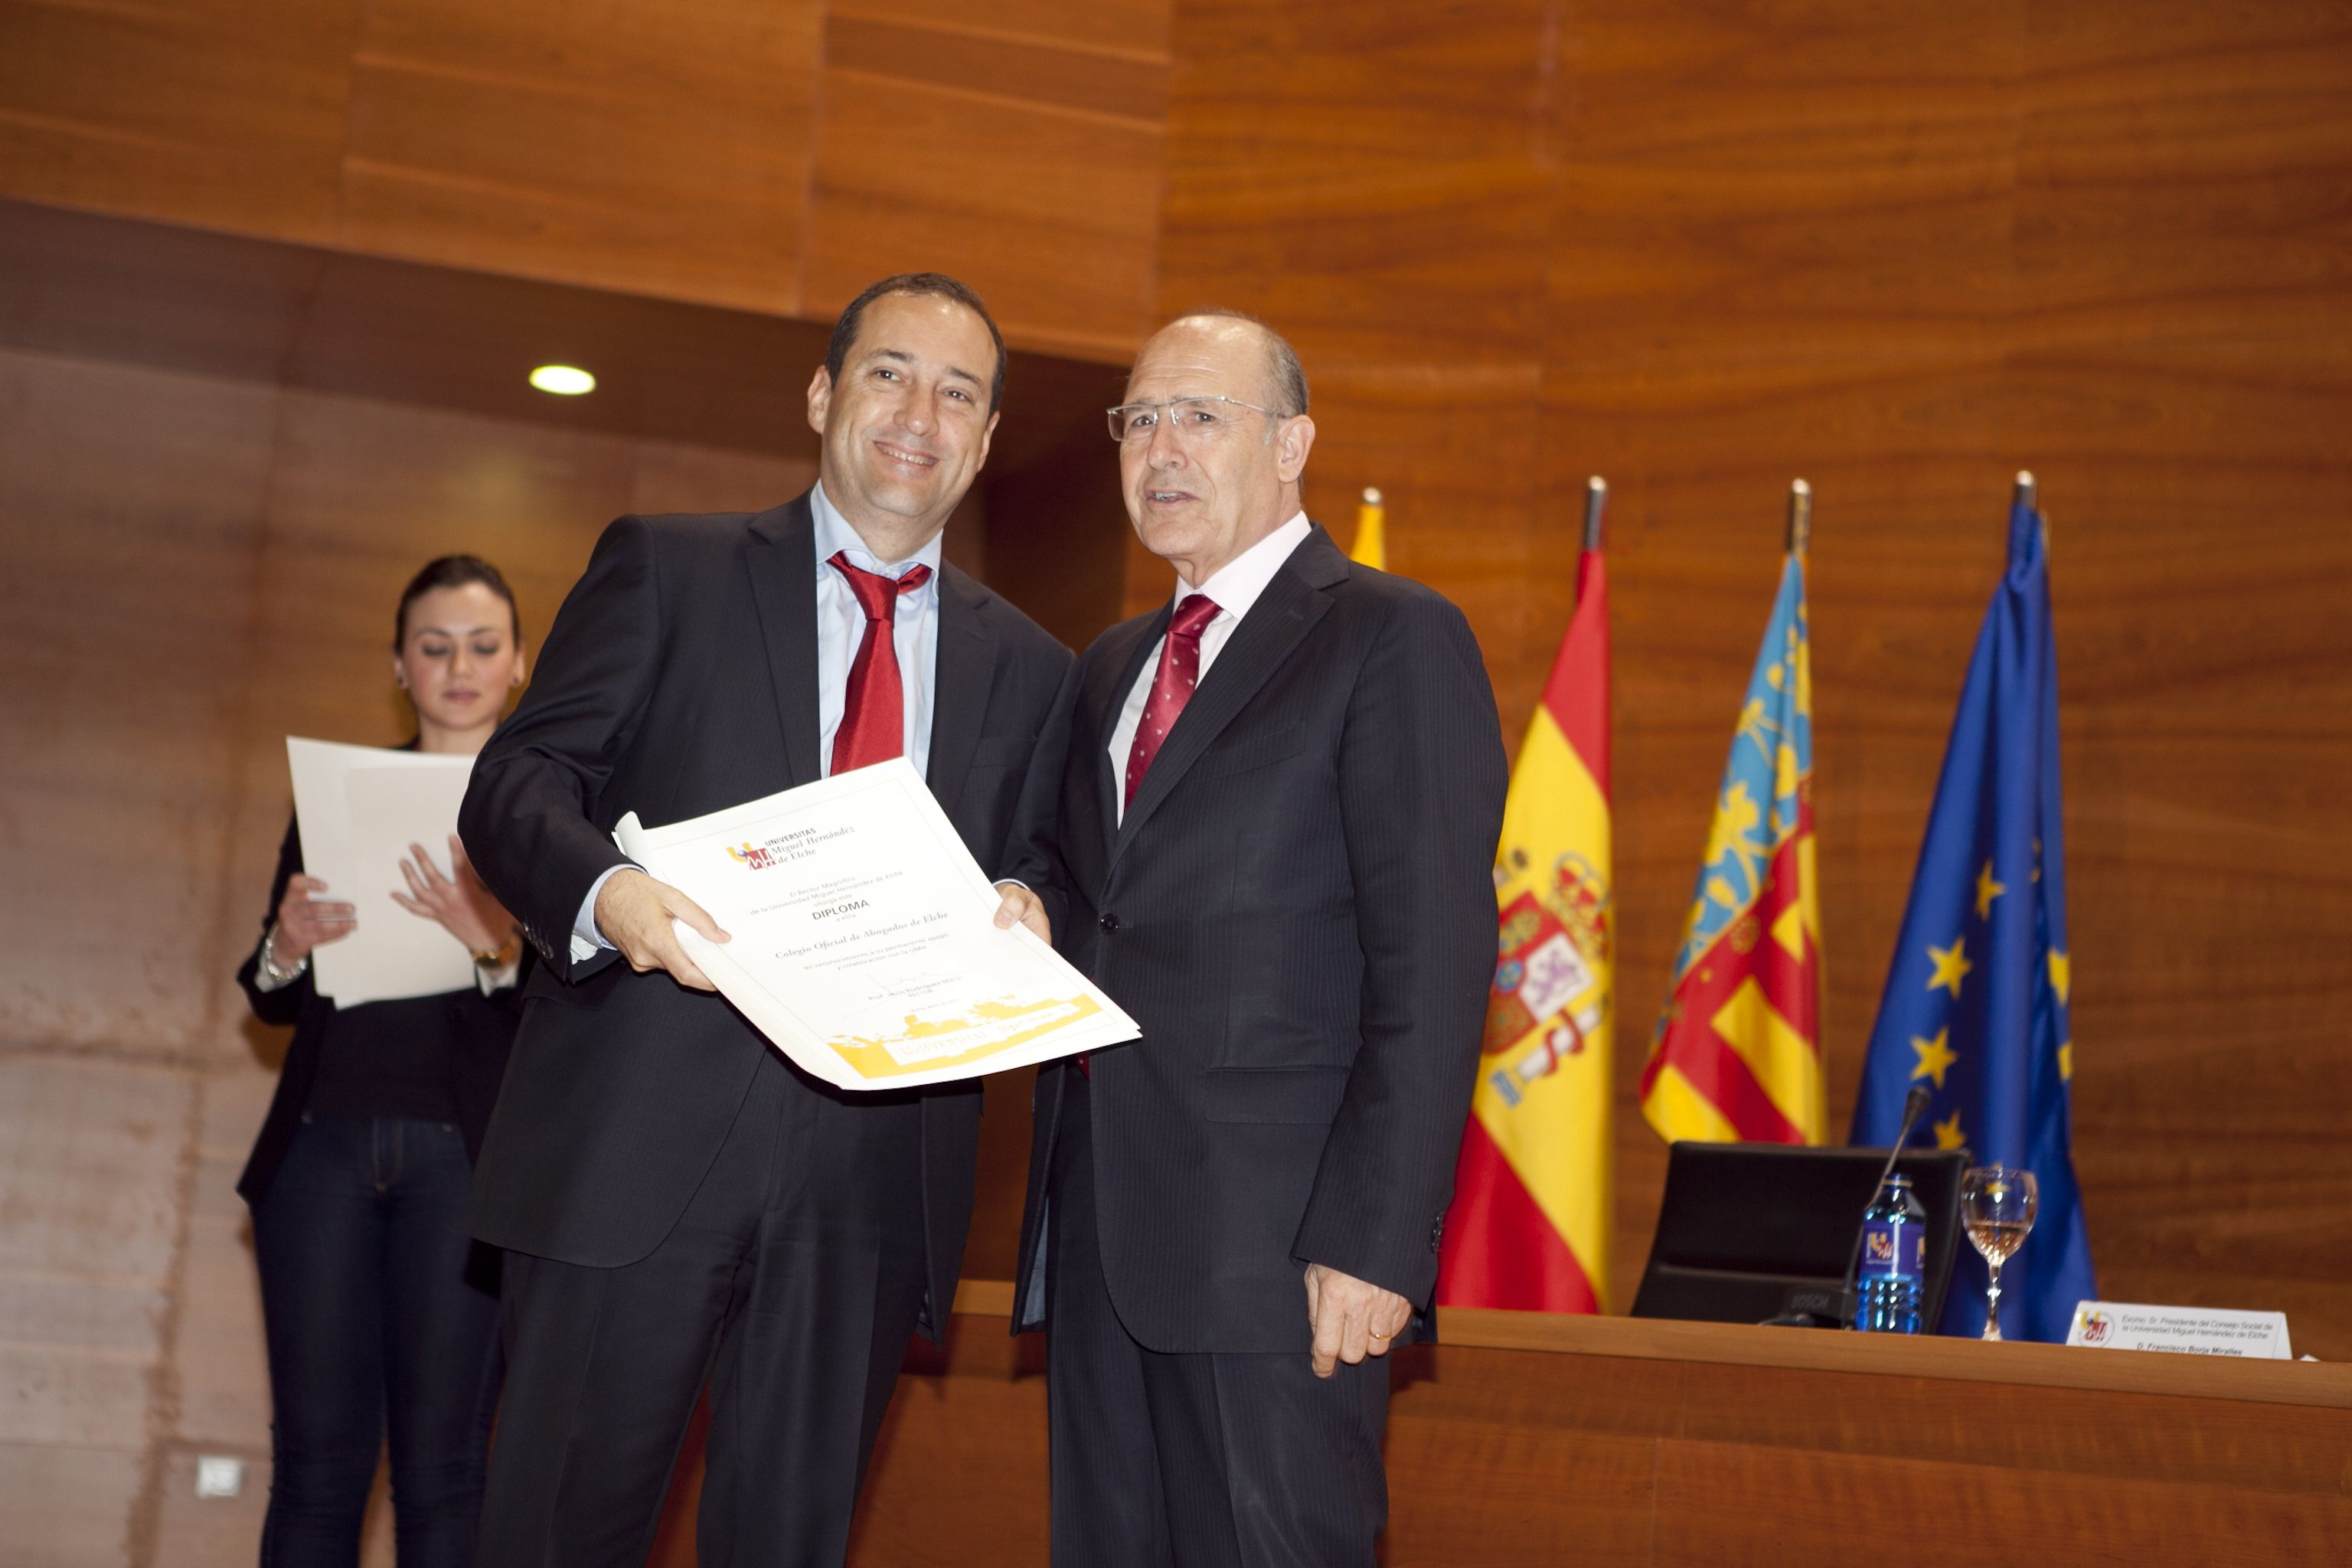 umh-diplomas-rector_mg_6894.jpg